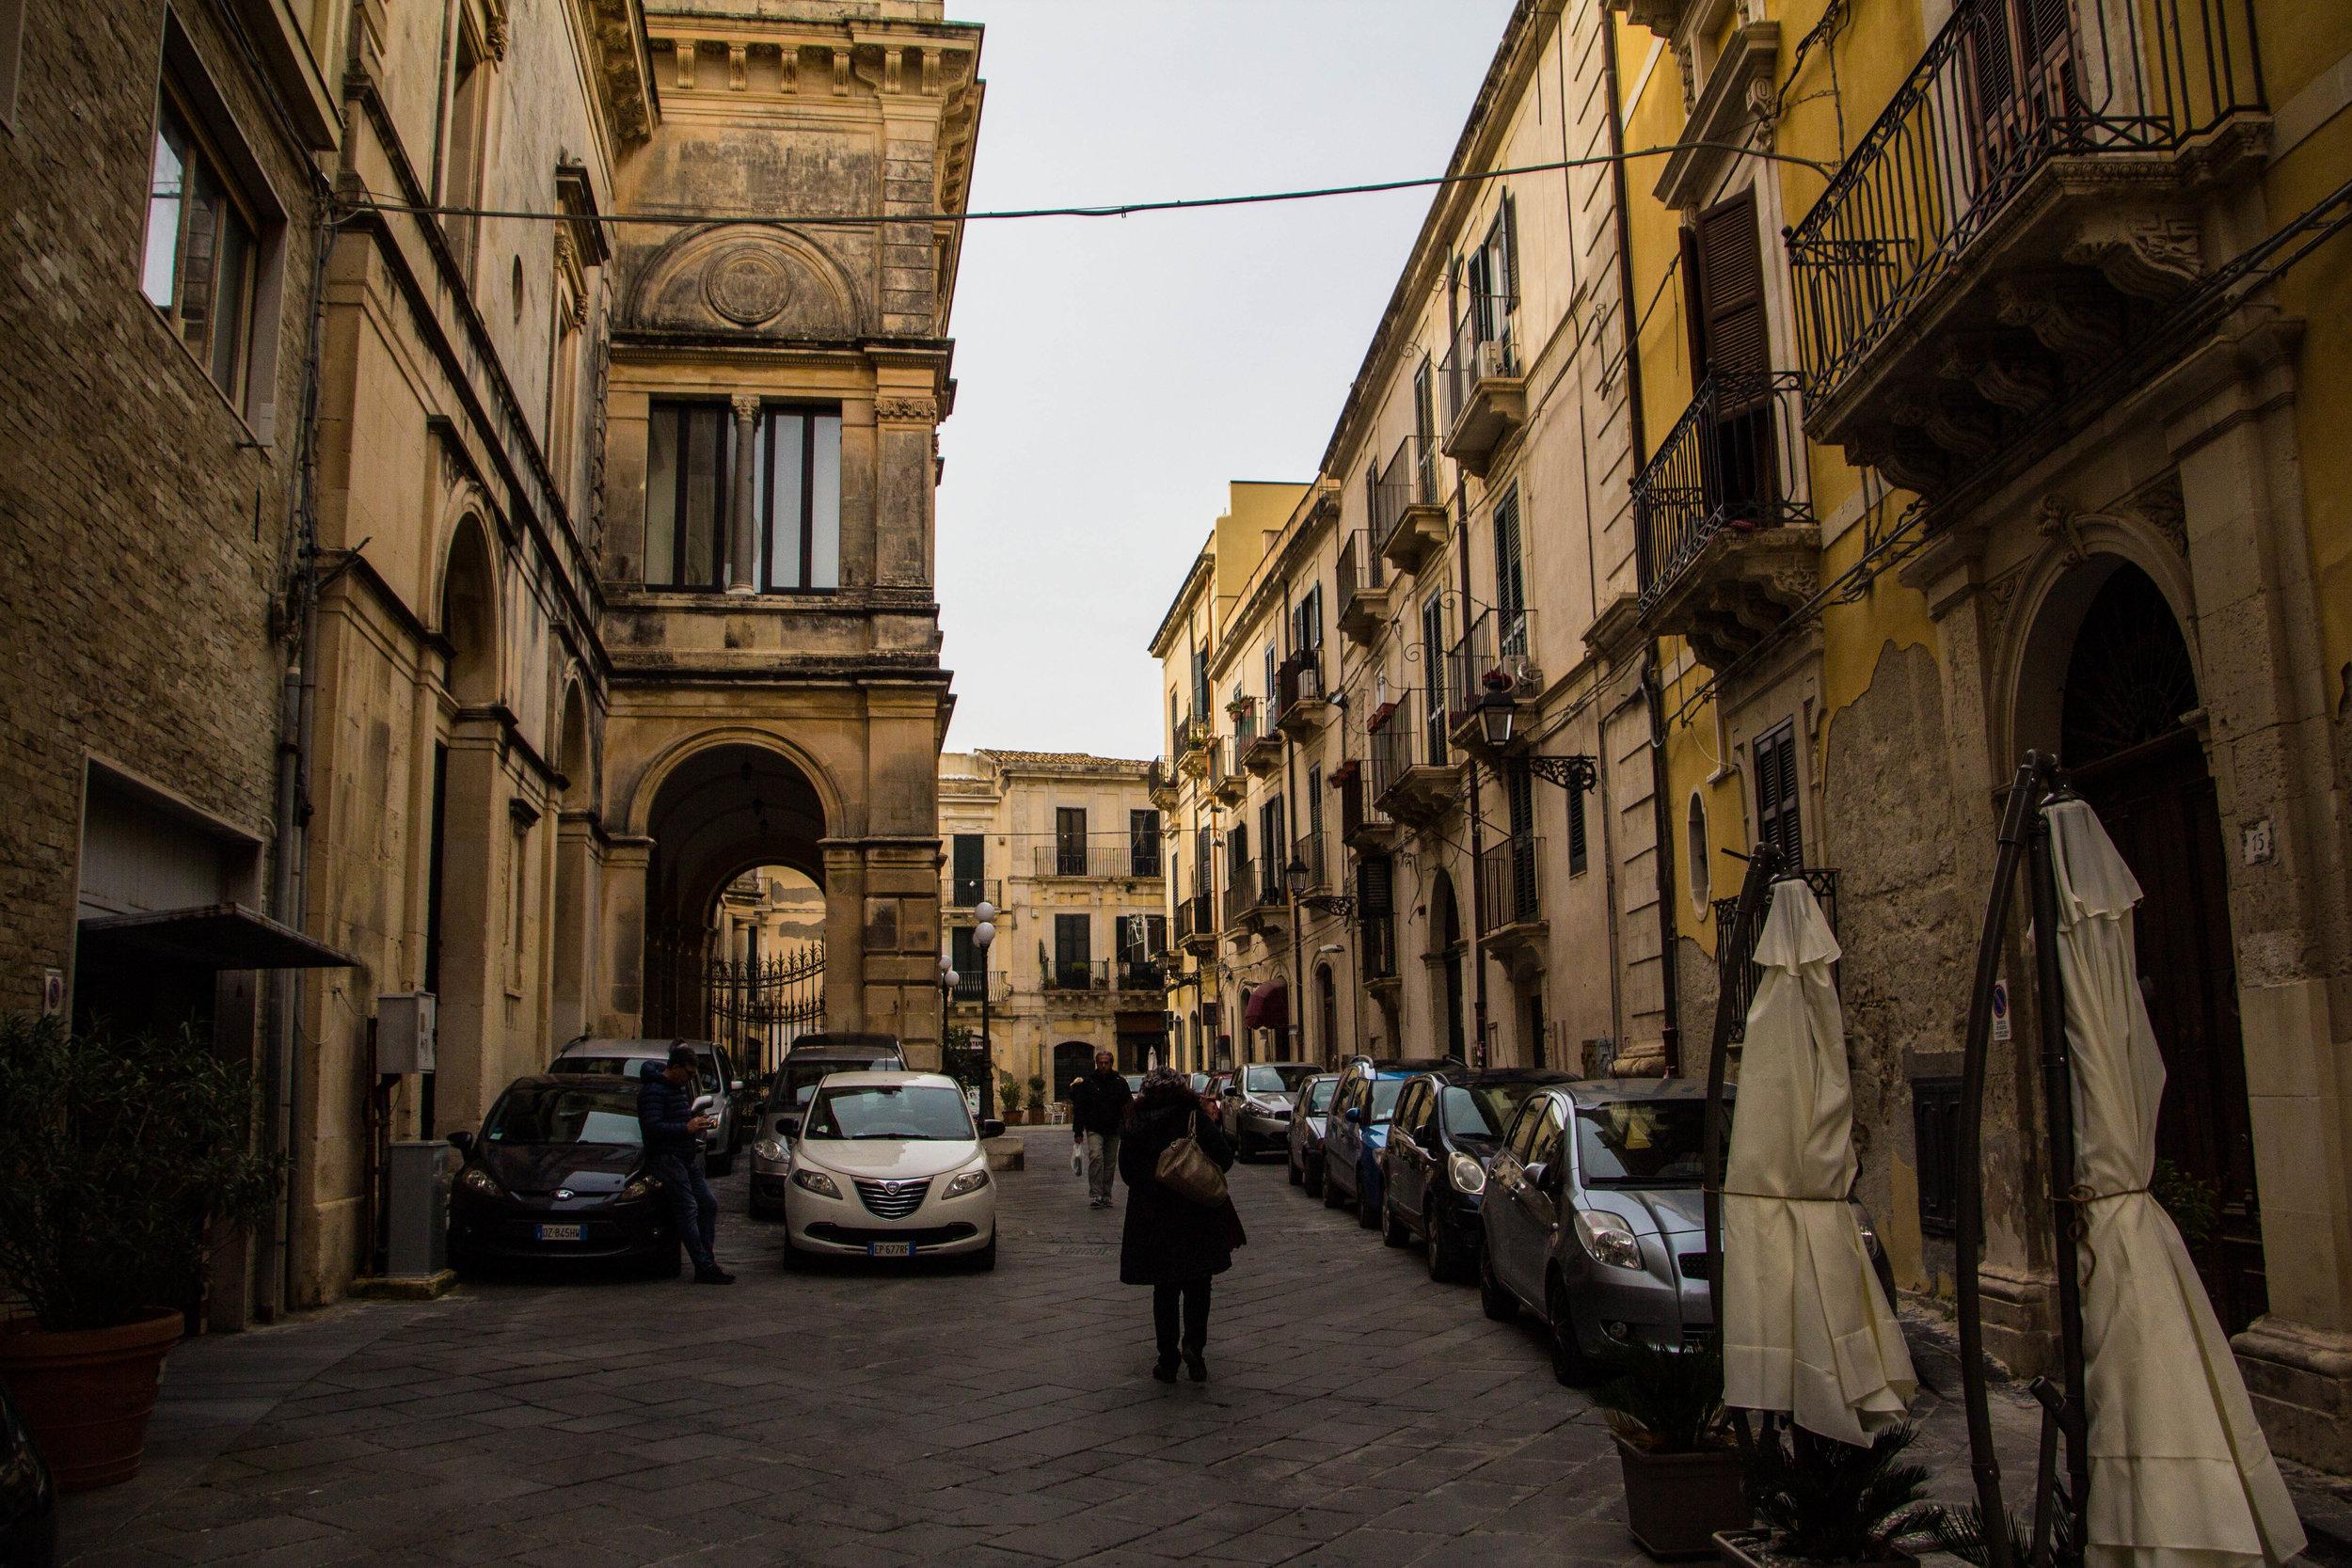 streets-ortygia-syracuse-sicily-37.jpg